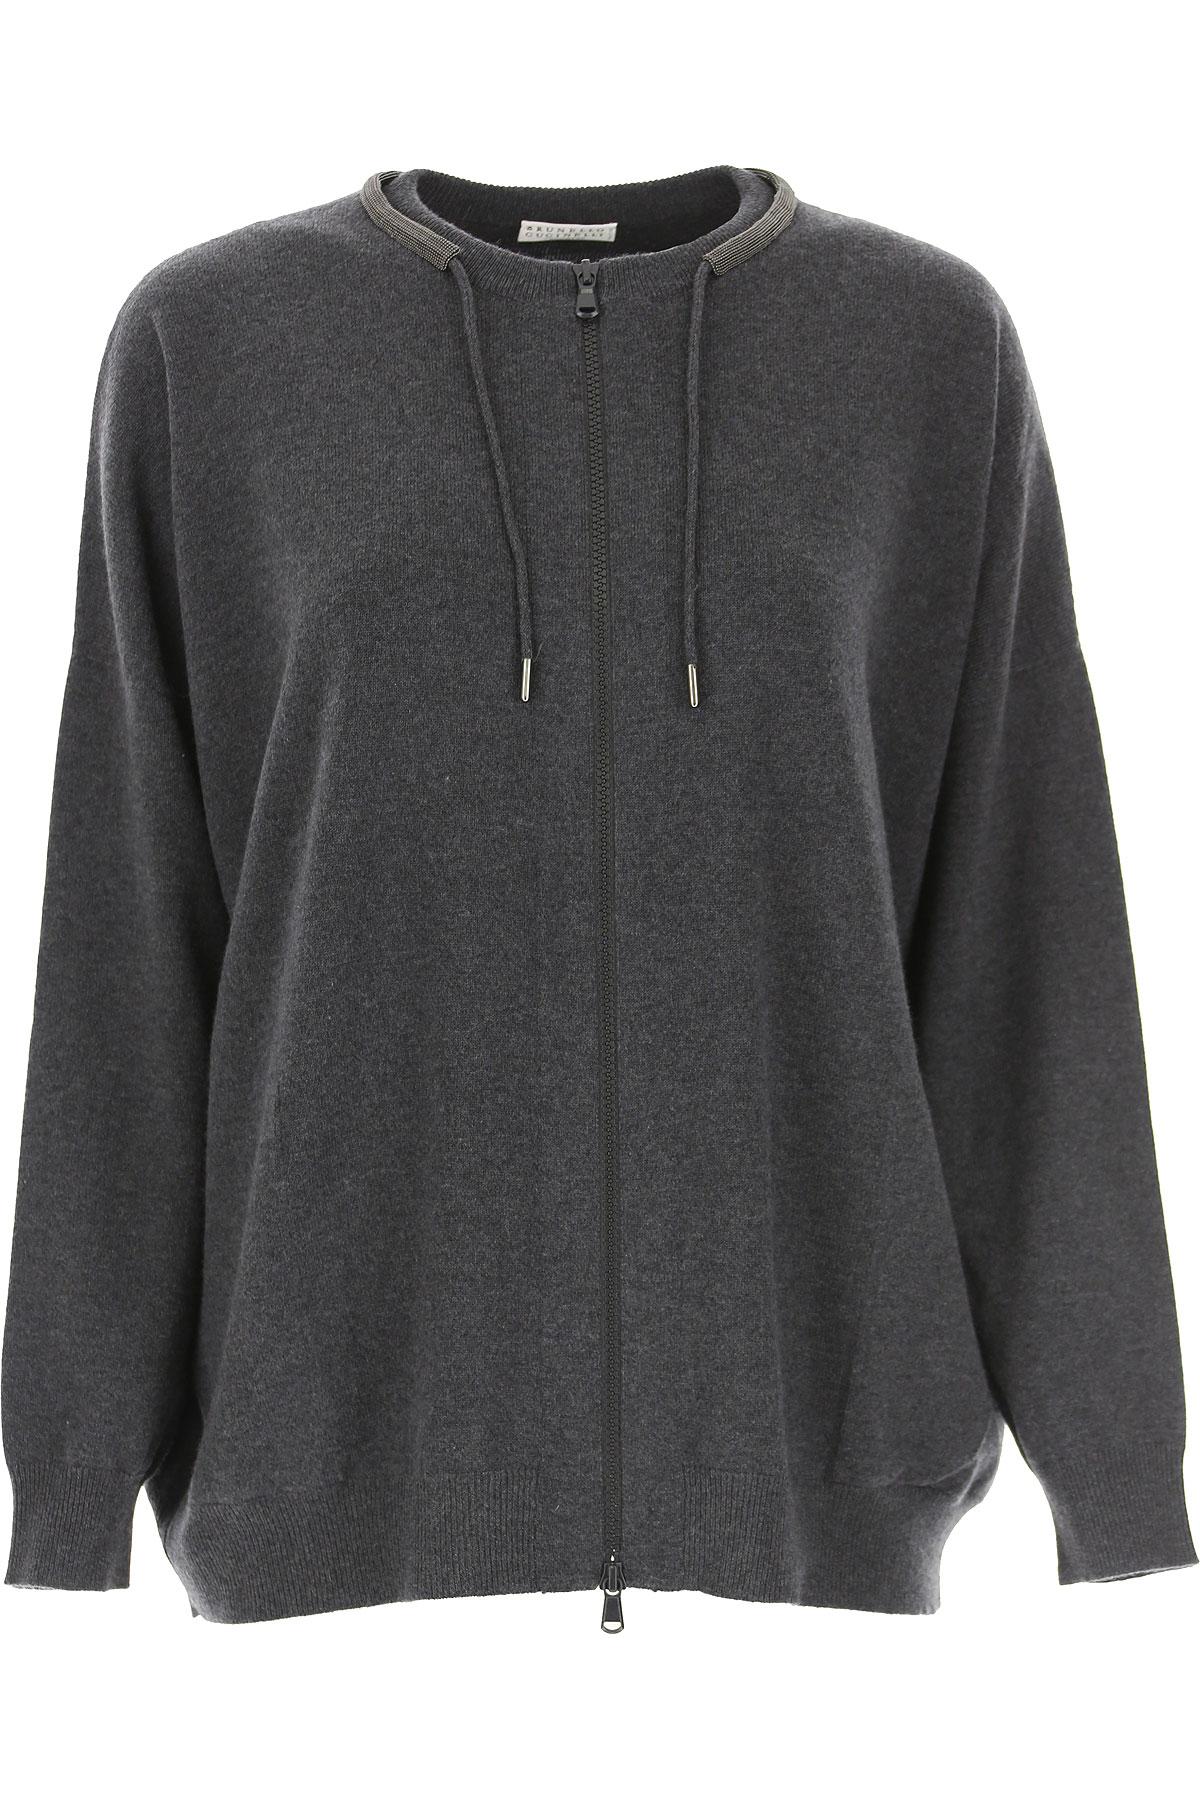 Brunello Cucinelli Sweater for Women Jumper On Sale, Dark Grey, Wool, 2019, 10 6 8